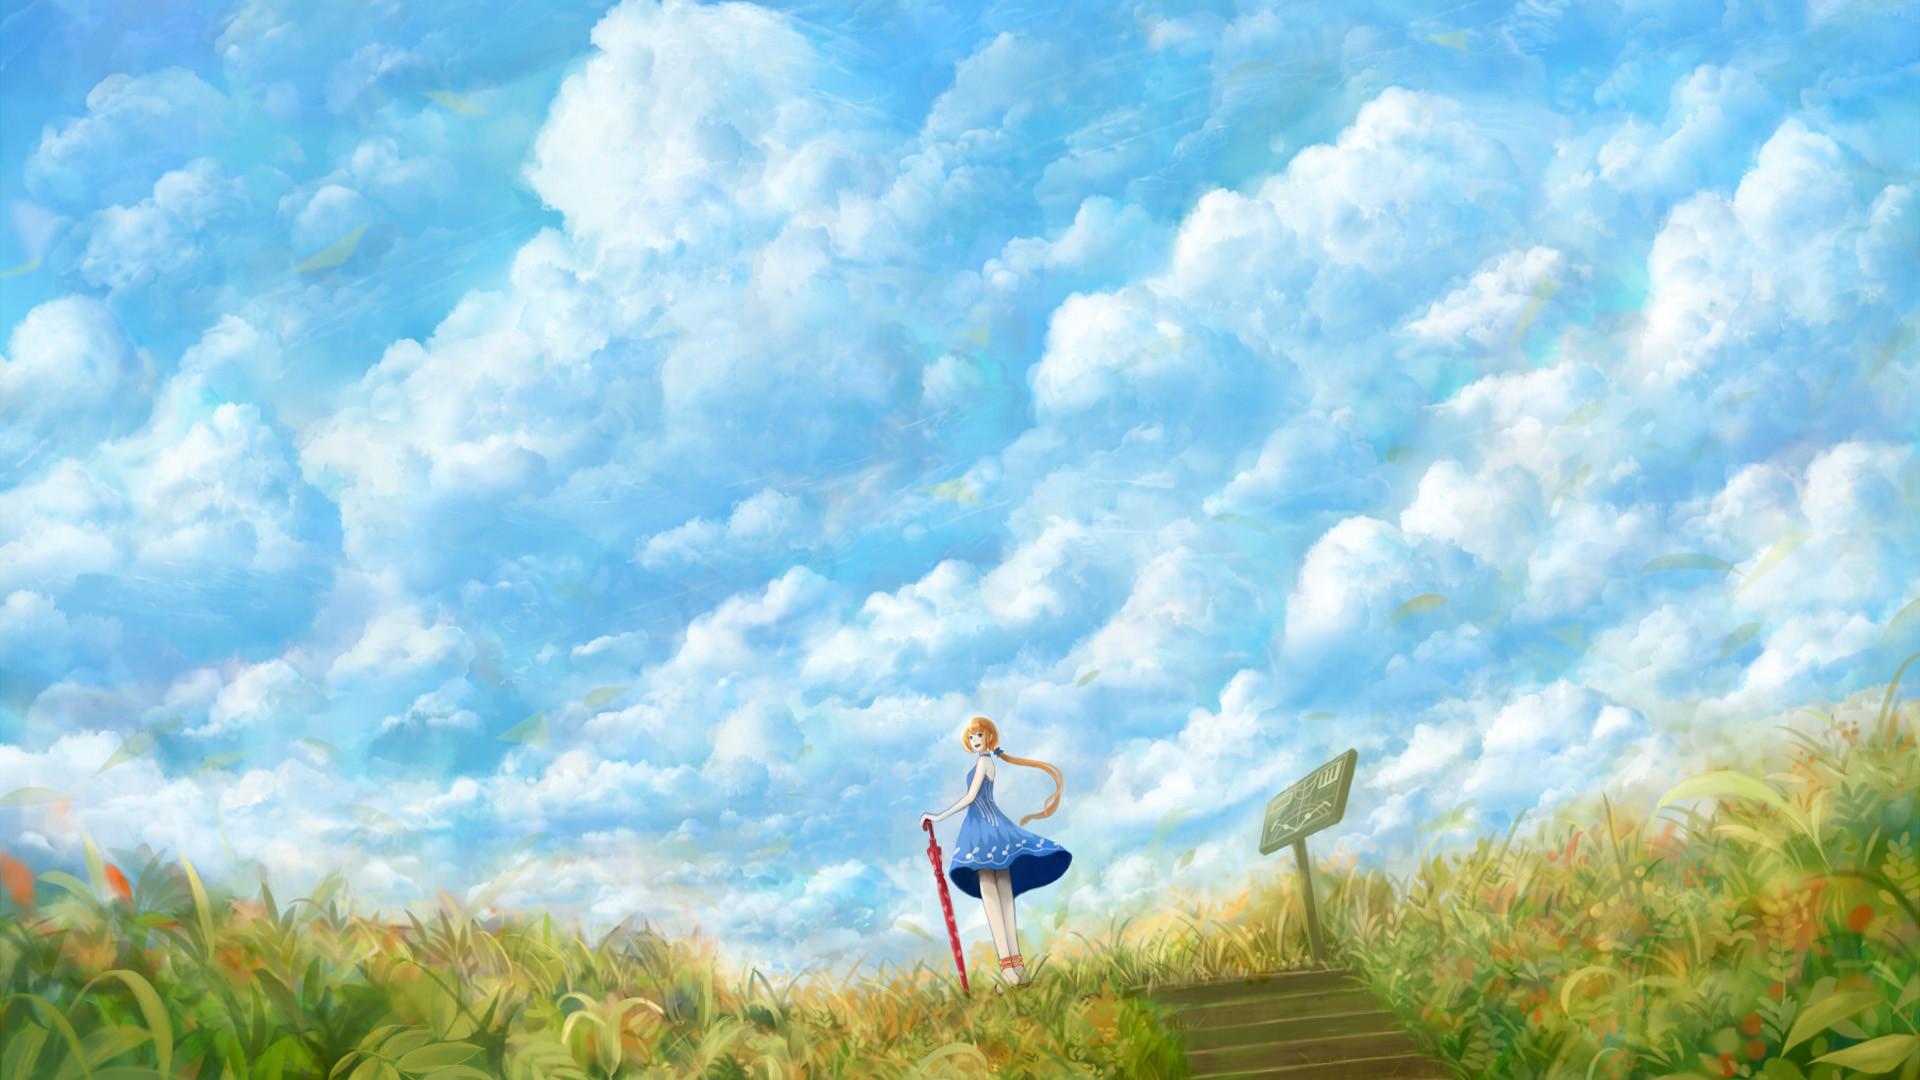 … Cloudy White Sky HD Wallpaper ID55958